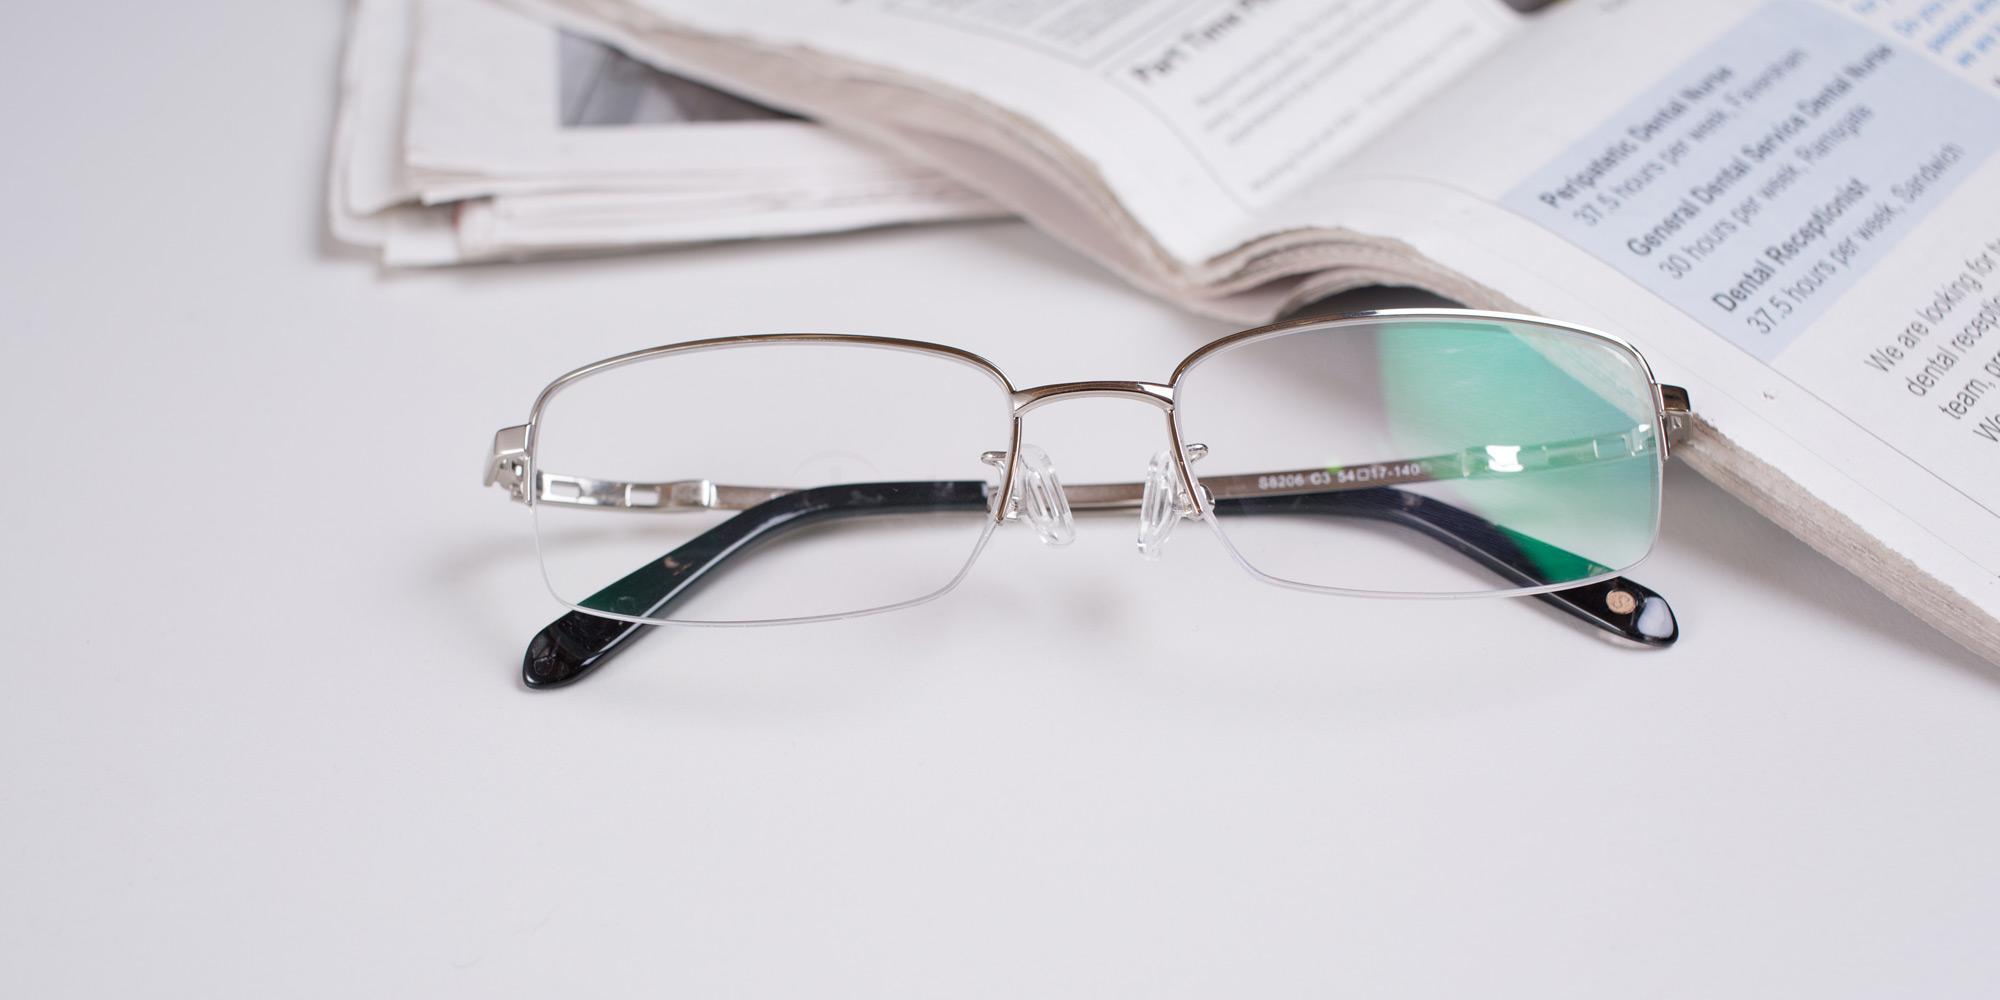 Hallmark S8206 Titanium glasses at SelectSpecs